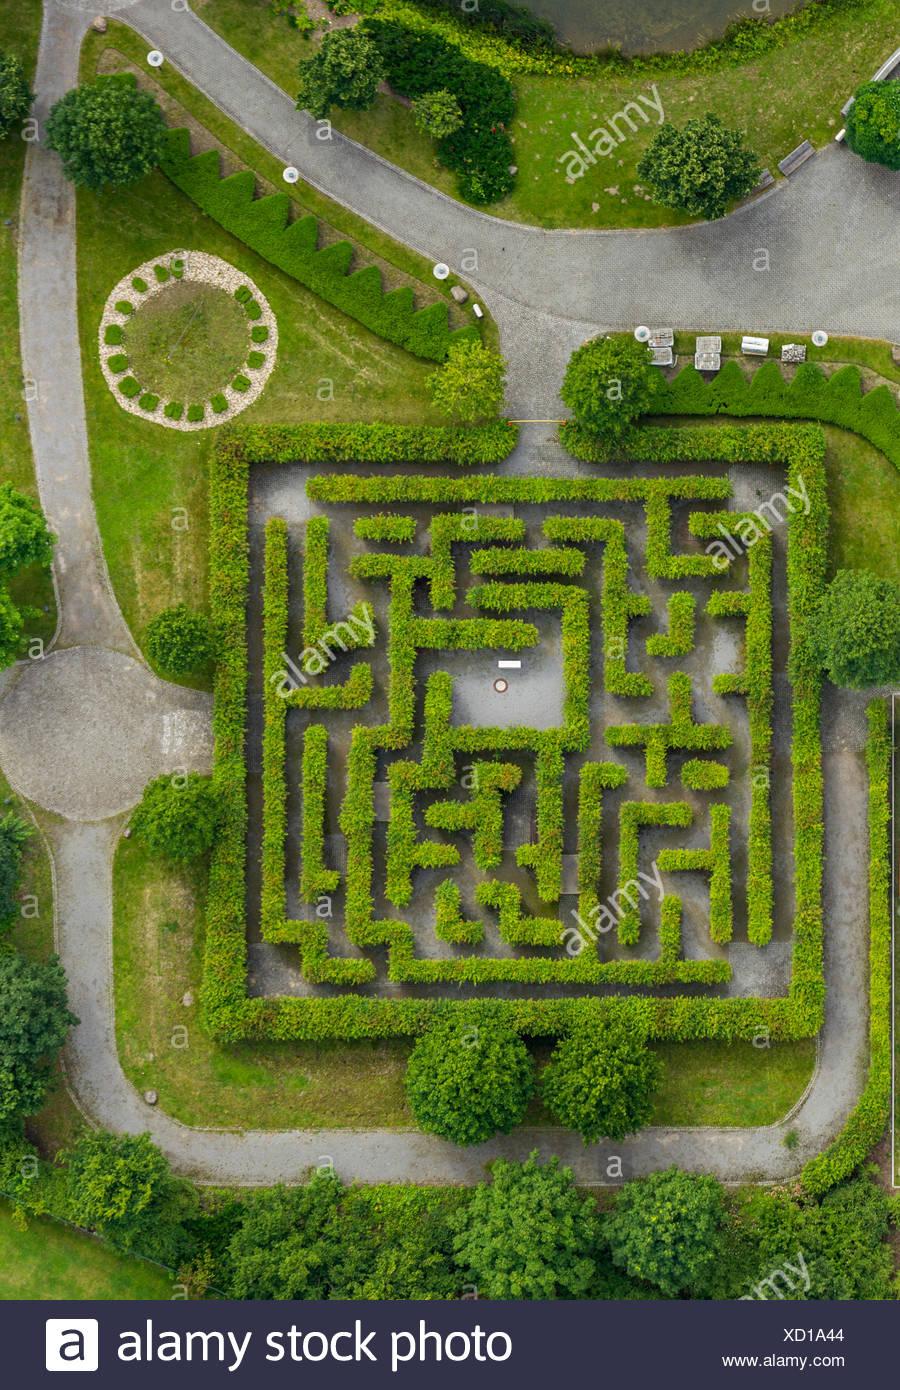 Aerial view, maze, Centropark, 'Centro' shopping centre, Neue Mitte quarter, Oberhausen, Ruhr Area, North Rhine-Westphalia - Stock Image